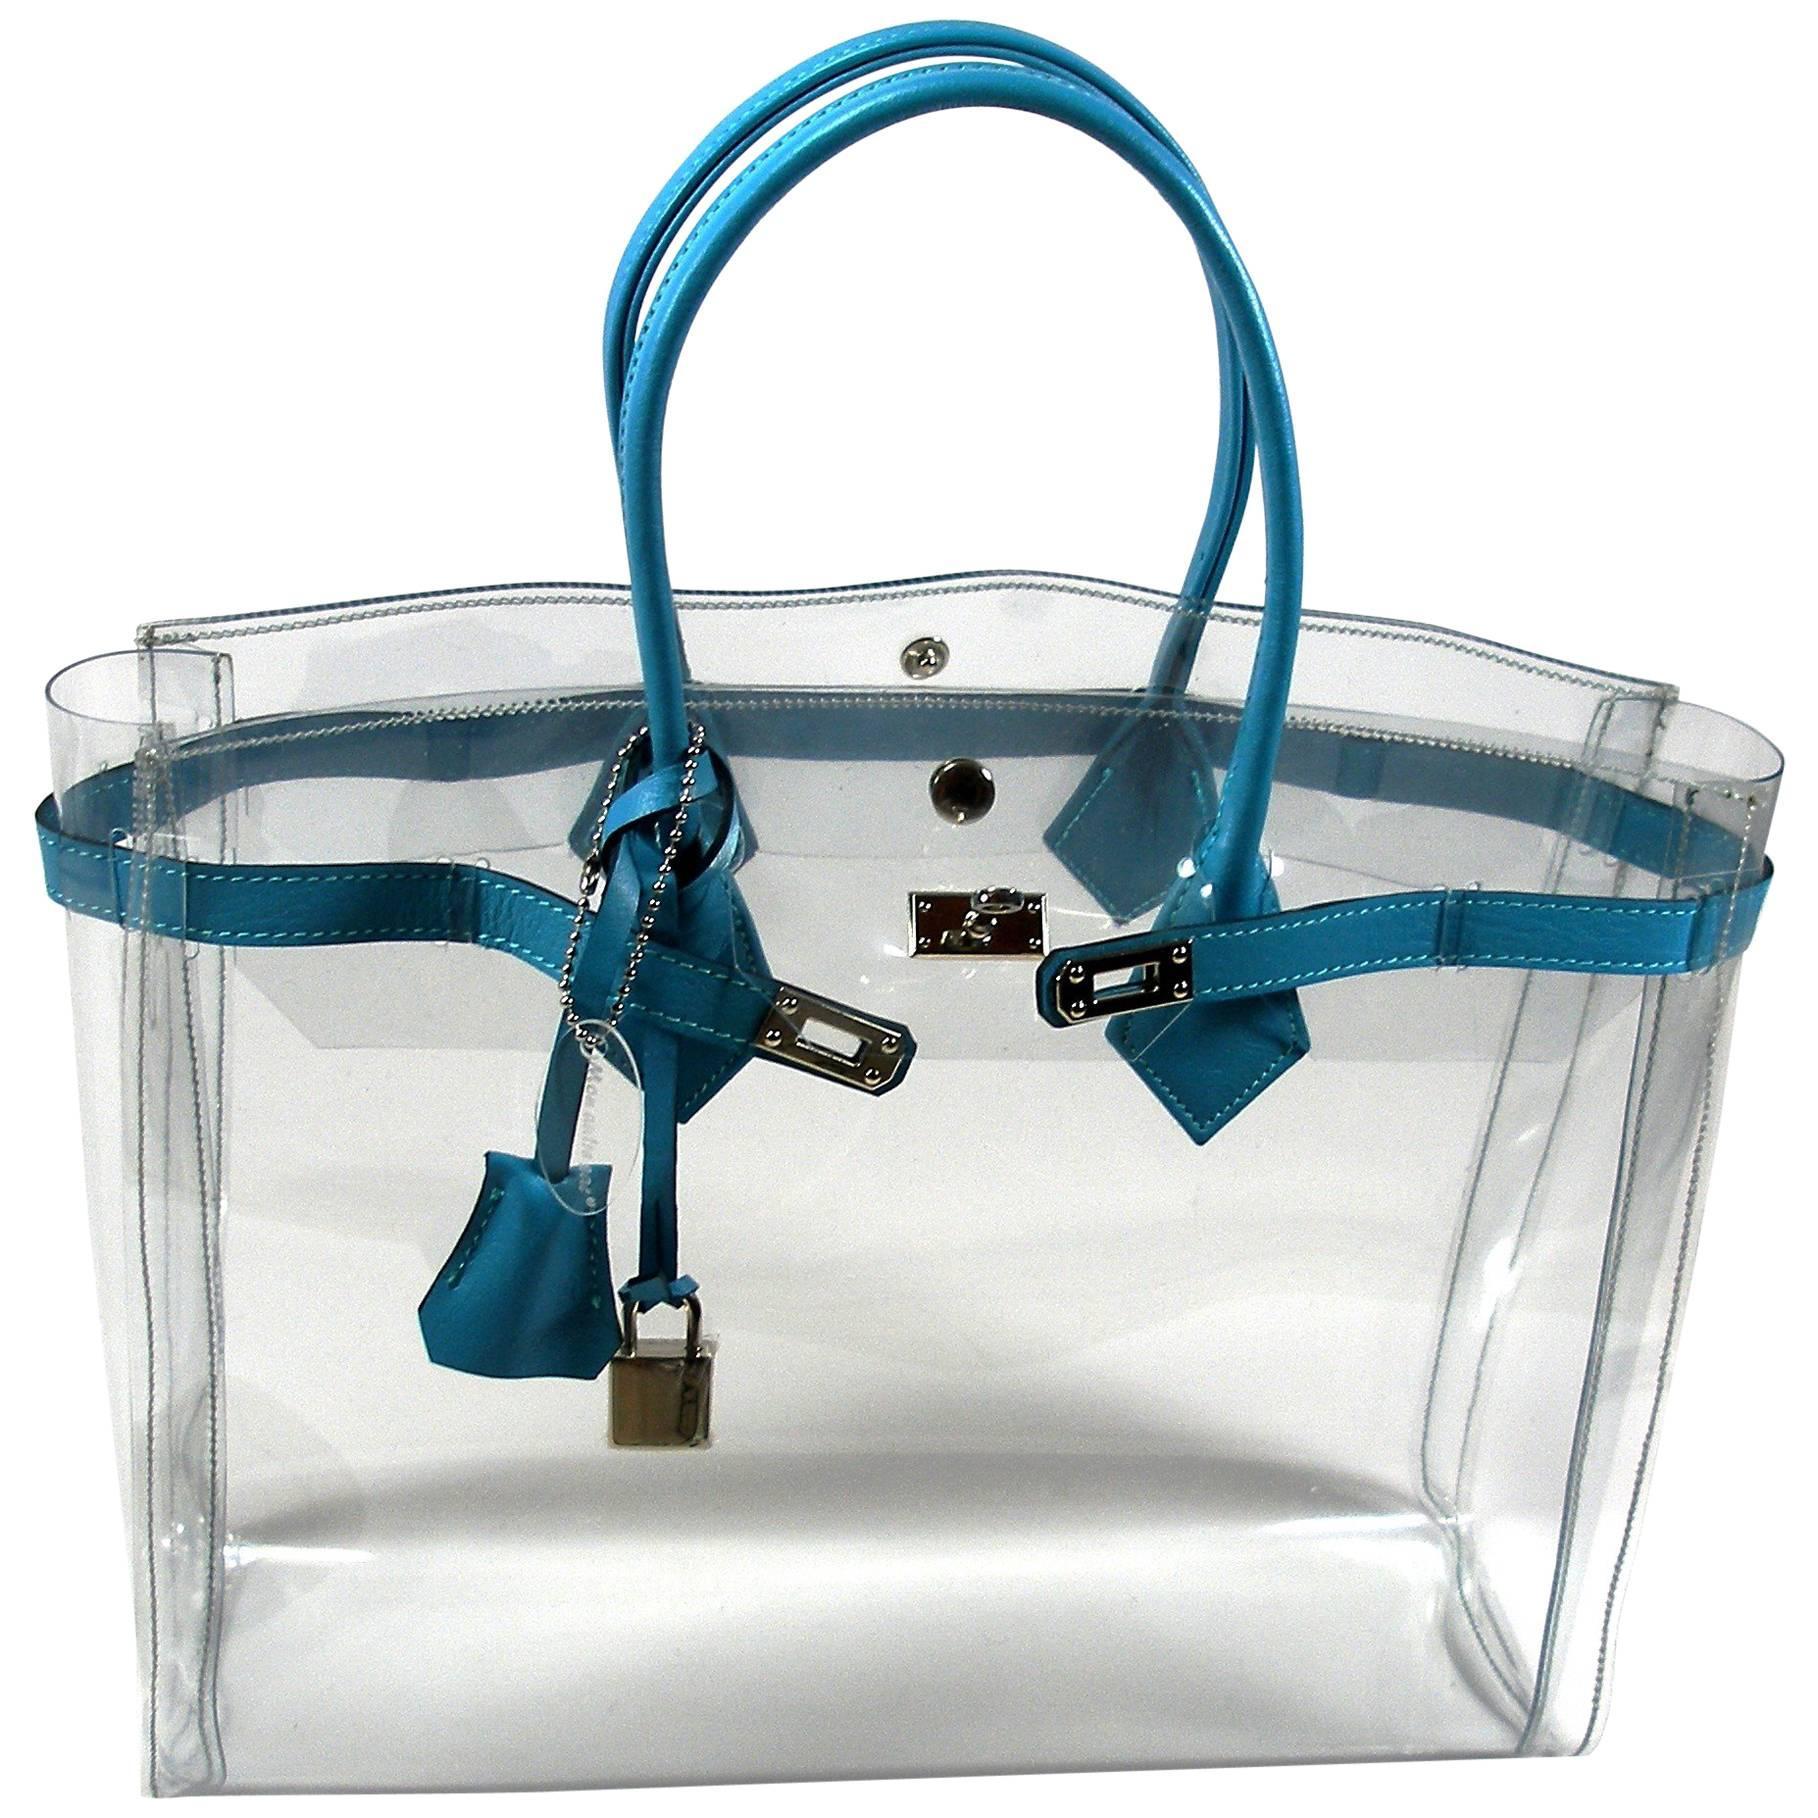 1stdibs Original Mon Autre Sac Cabas Diamant Pvc And Bleu Ciel Leather / Brand New LyX22CT